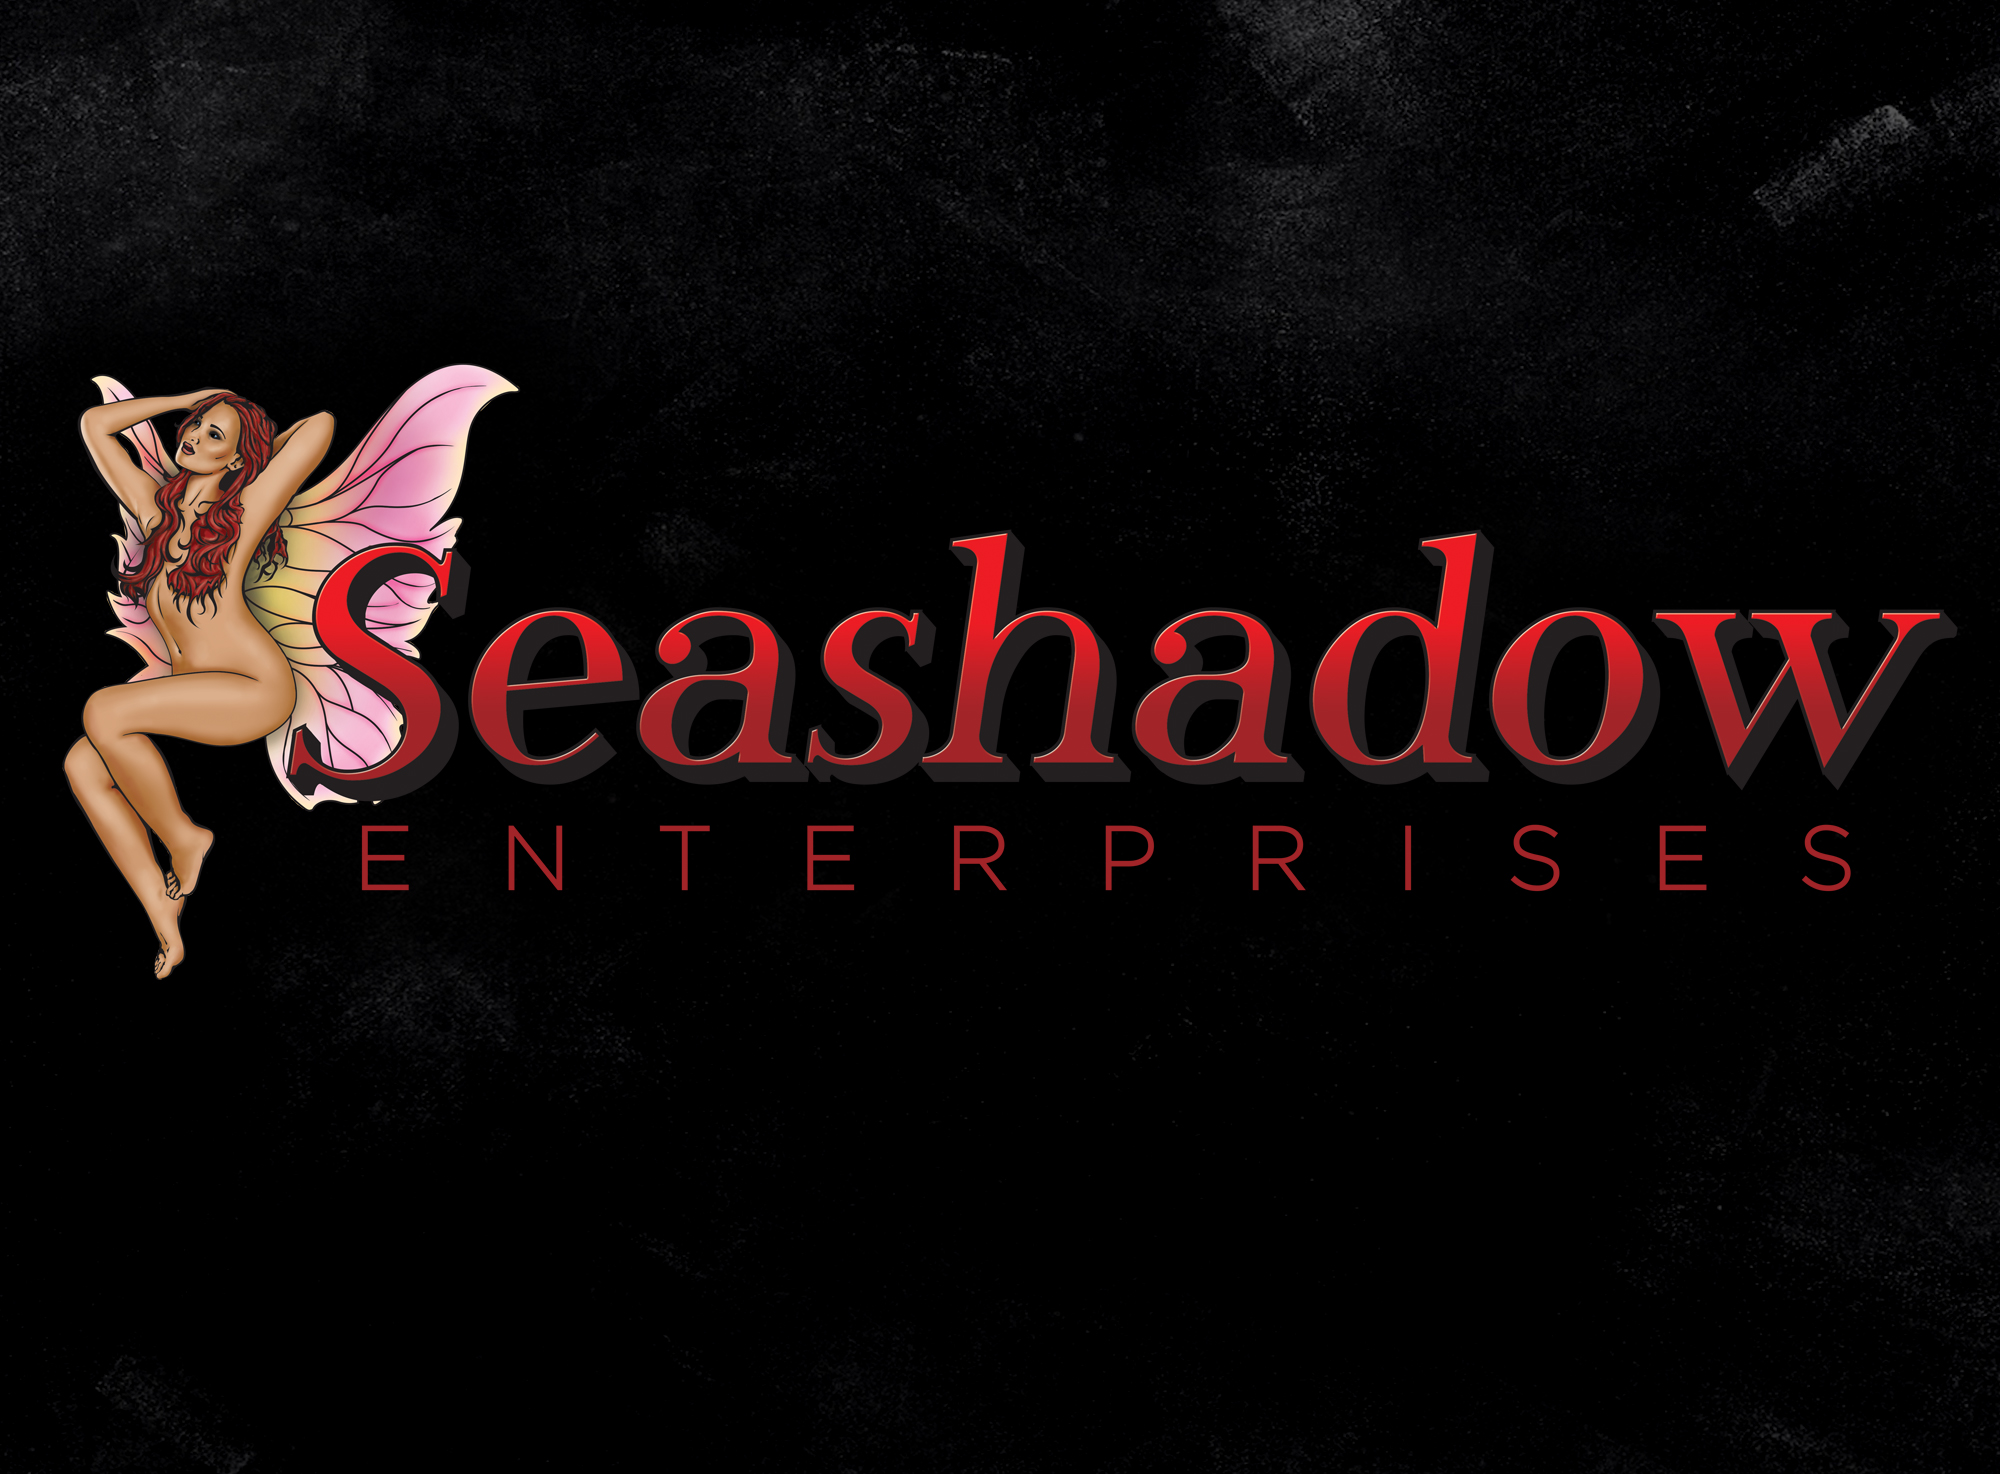 Seashadow Enterprises